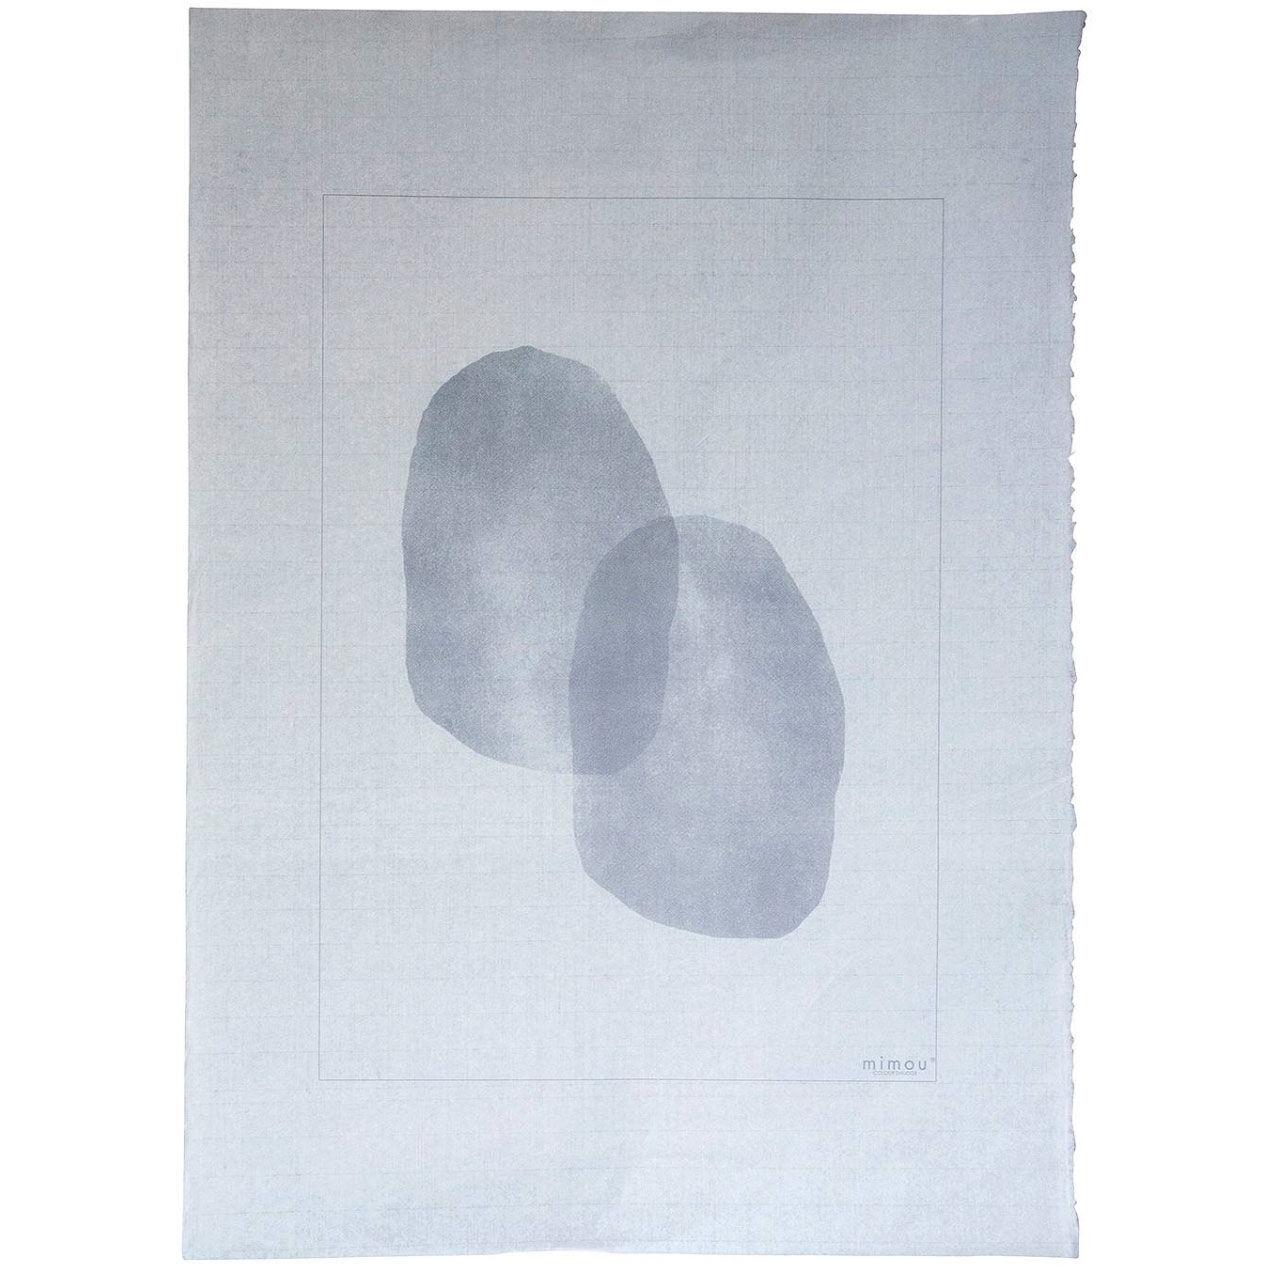 Mimou-Color Smudge Juliste 50x70 cm, Harmaa